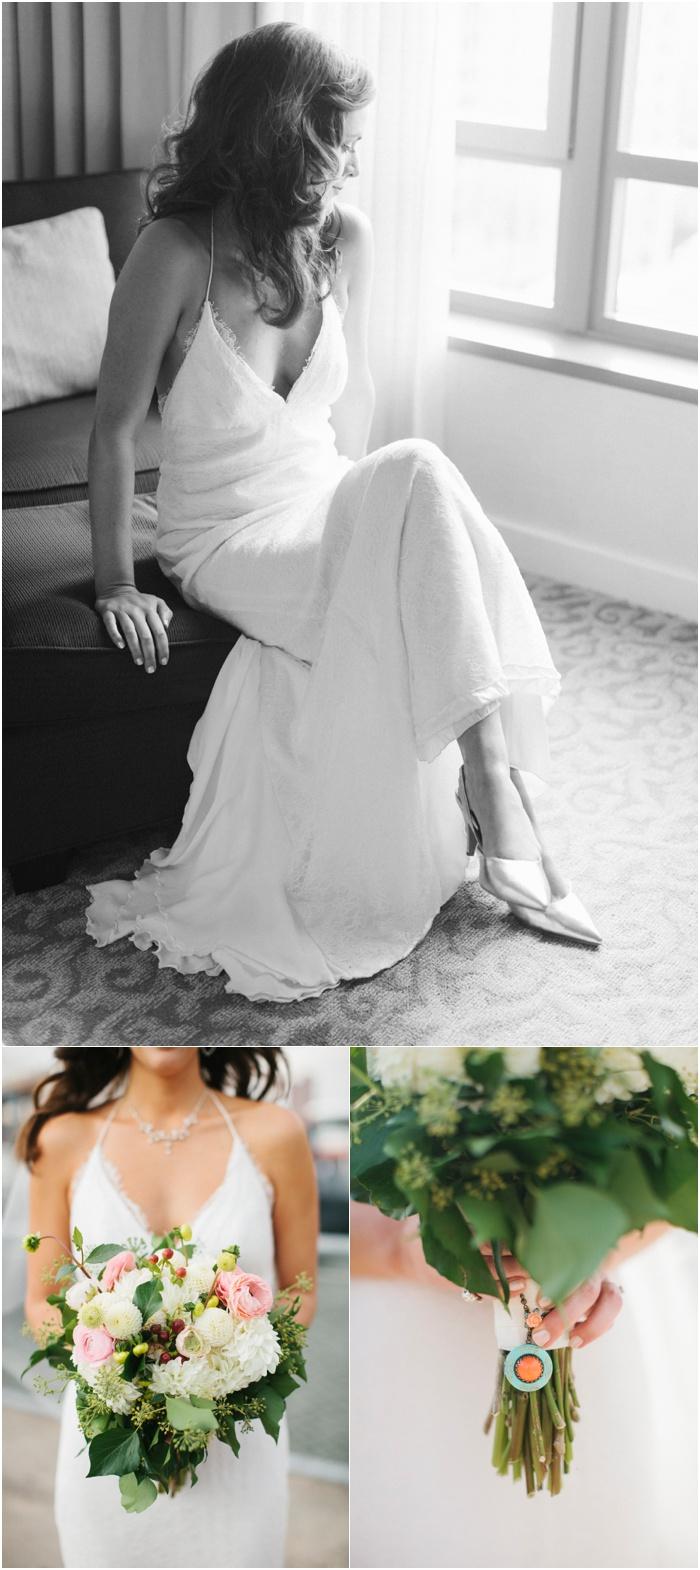 04_new york wedding photographer.jpeg